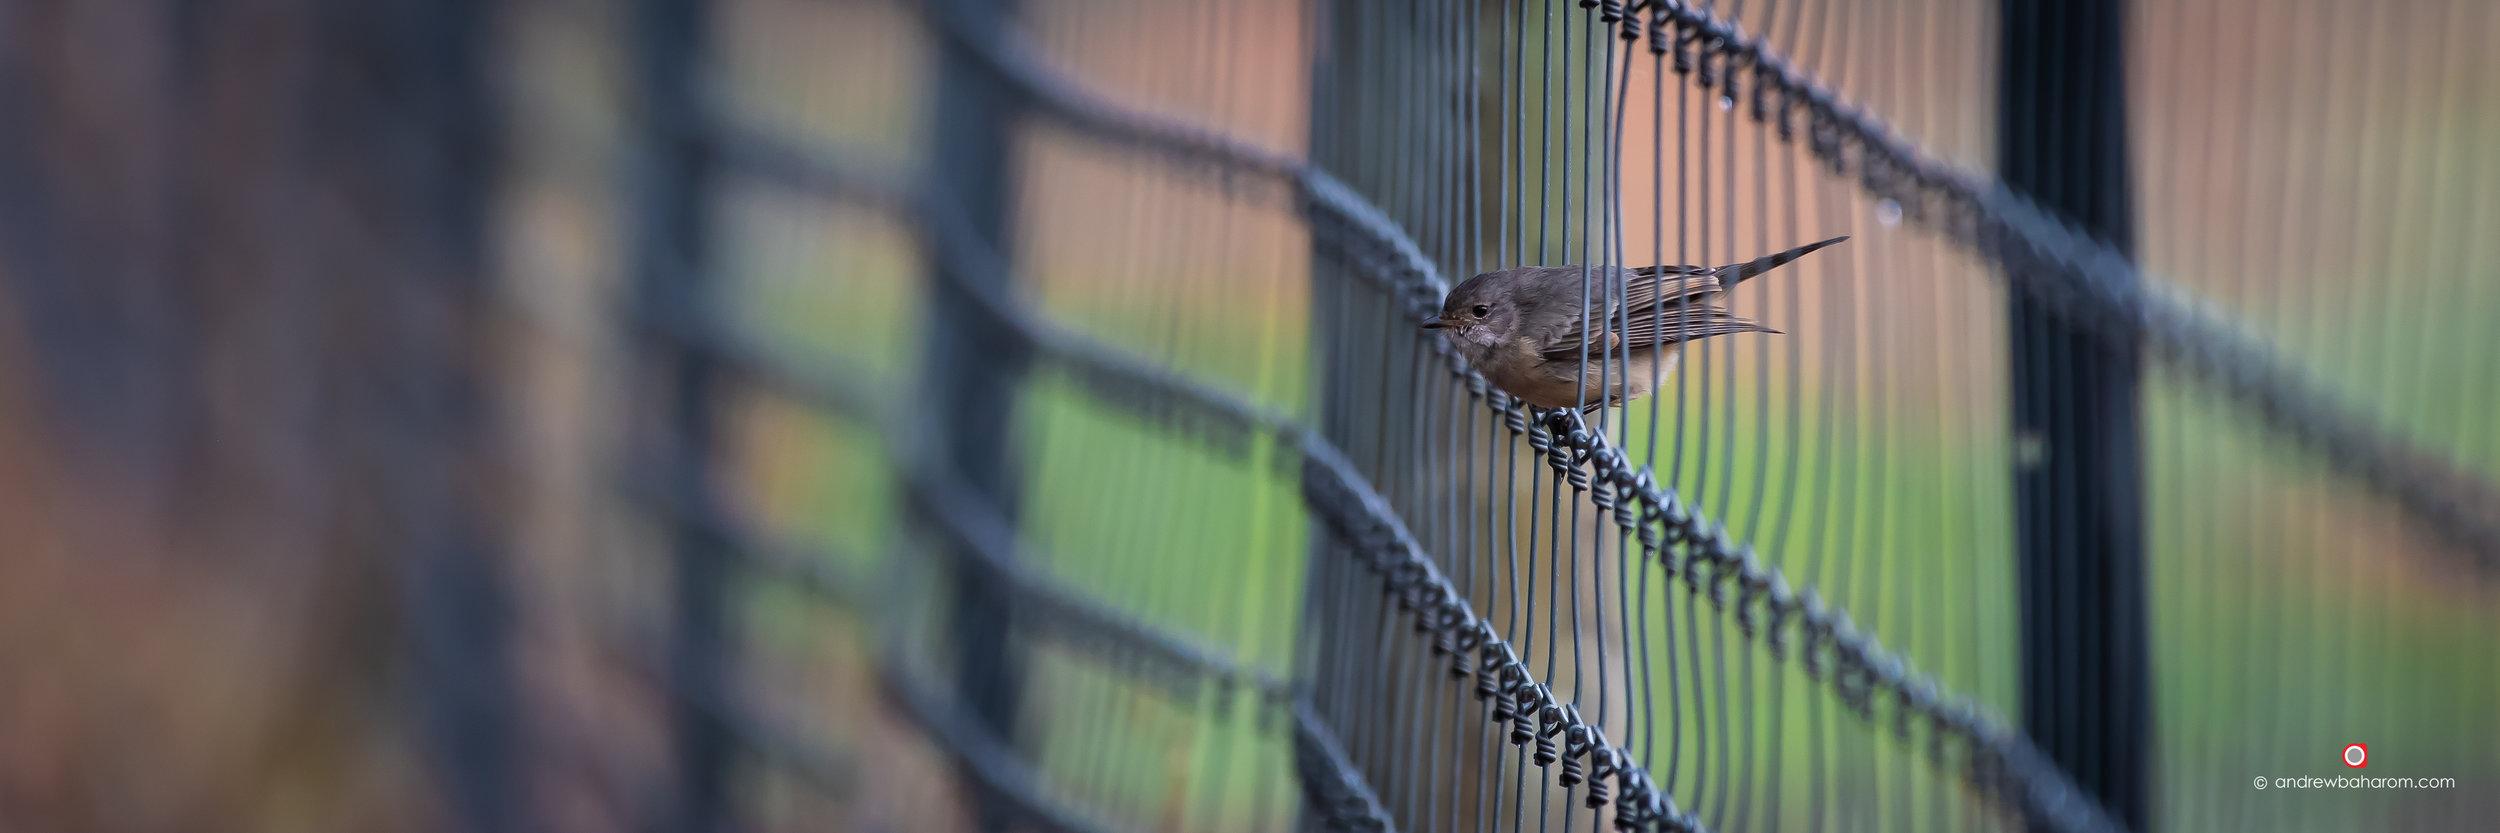 Dwellingup Bird.jpg